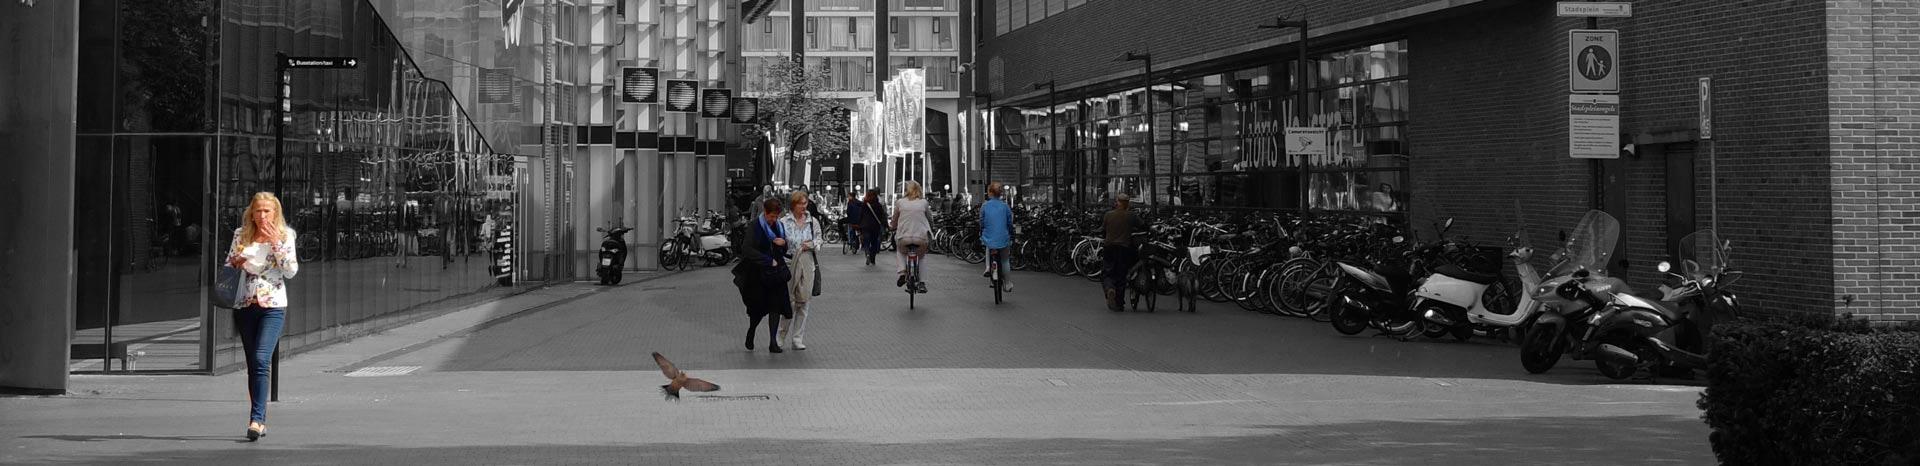 Letselschade advocaat Amstelveen | LetselPro